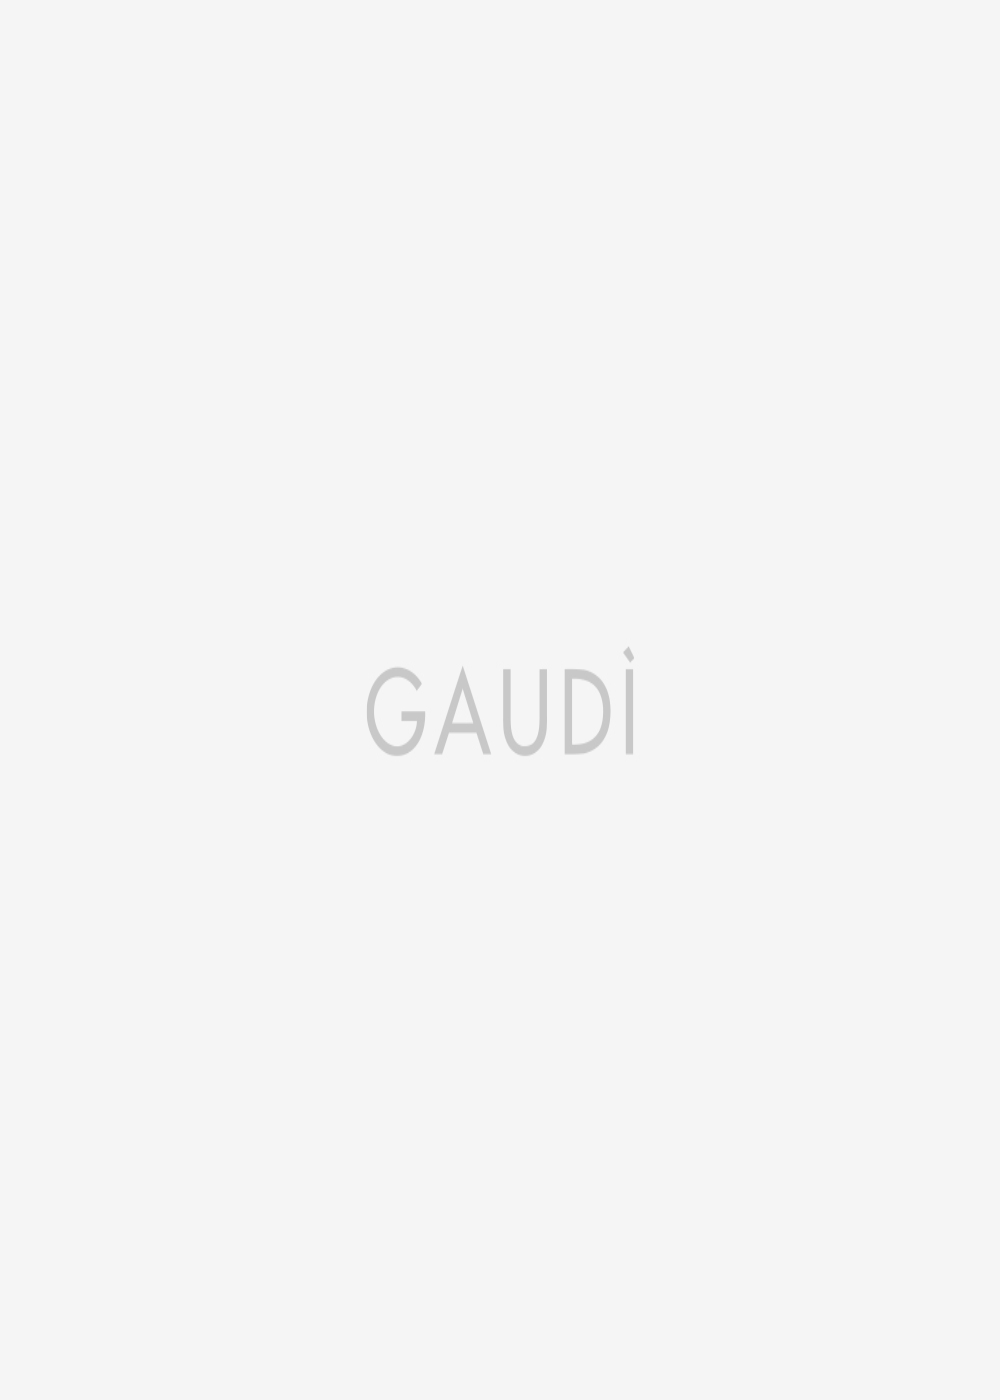 Down Jacket Gaudì Fashion